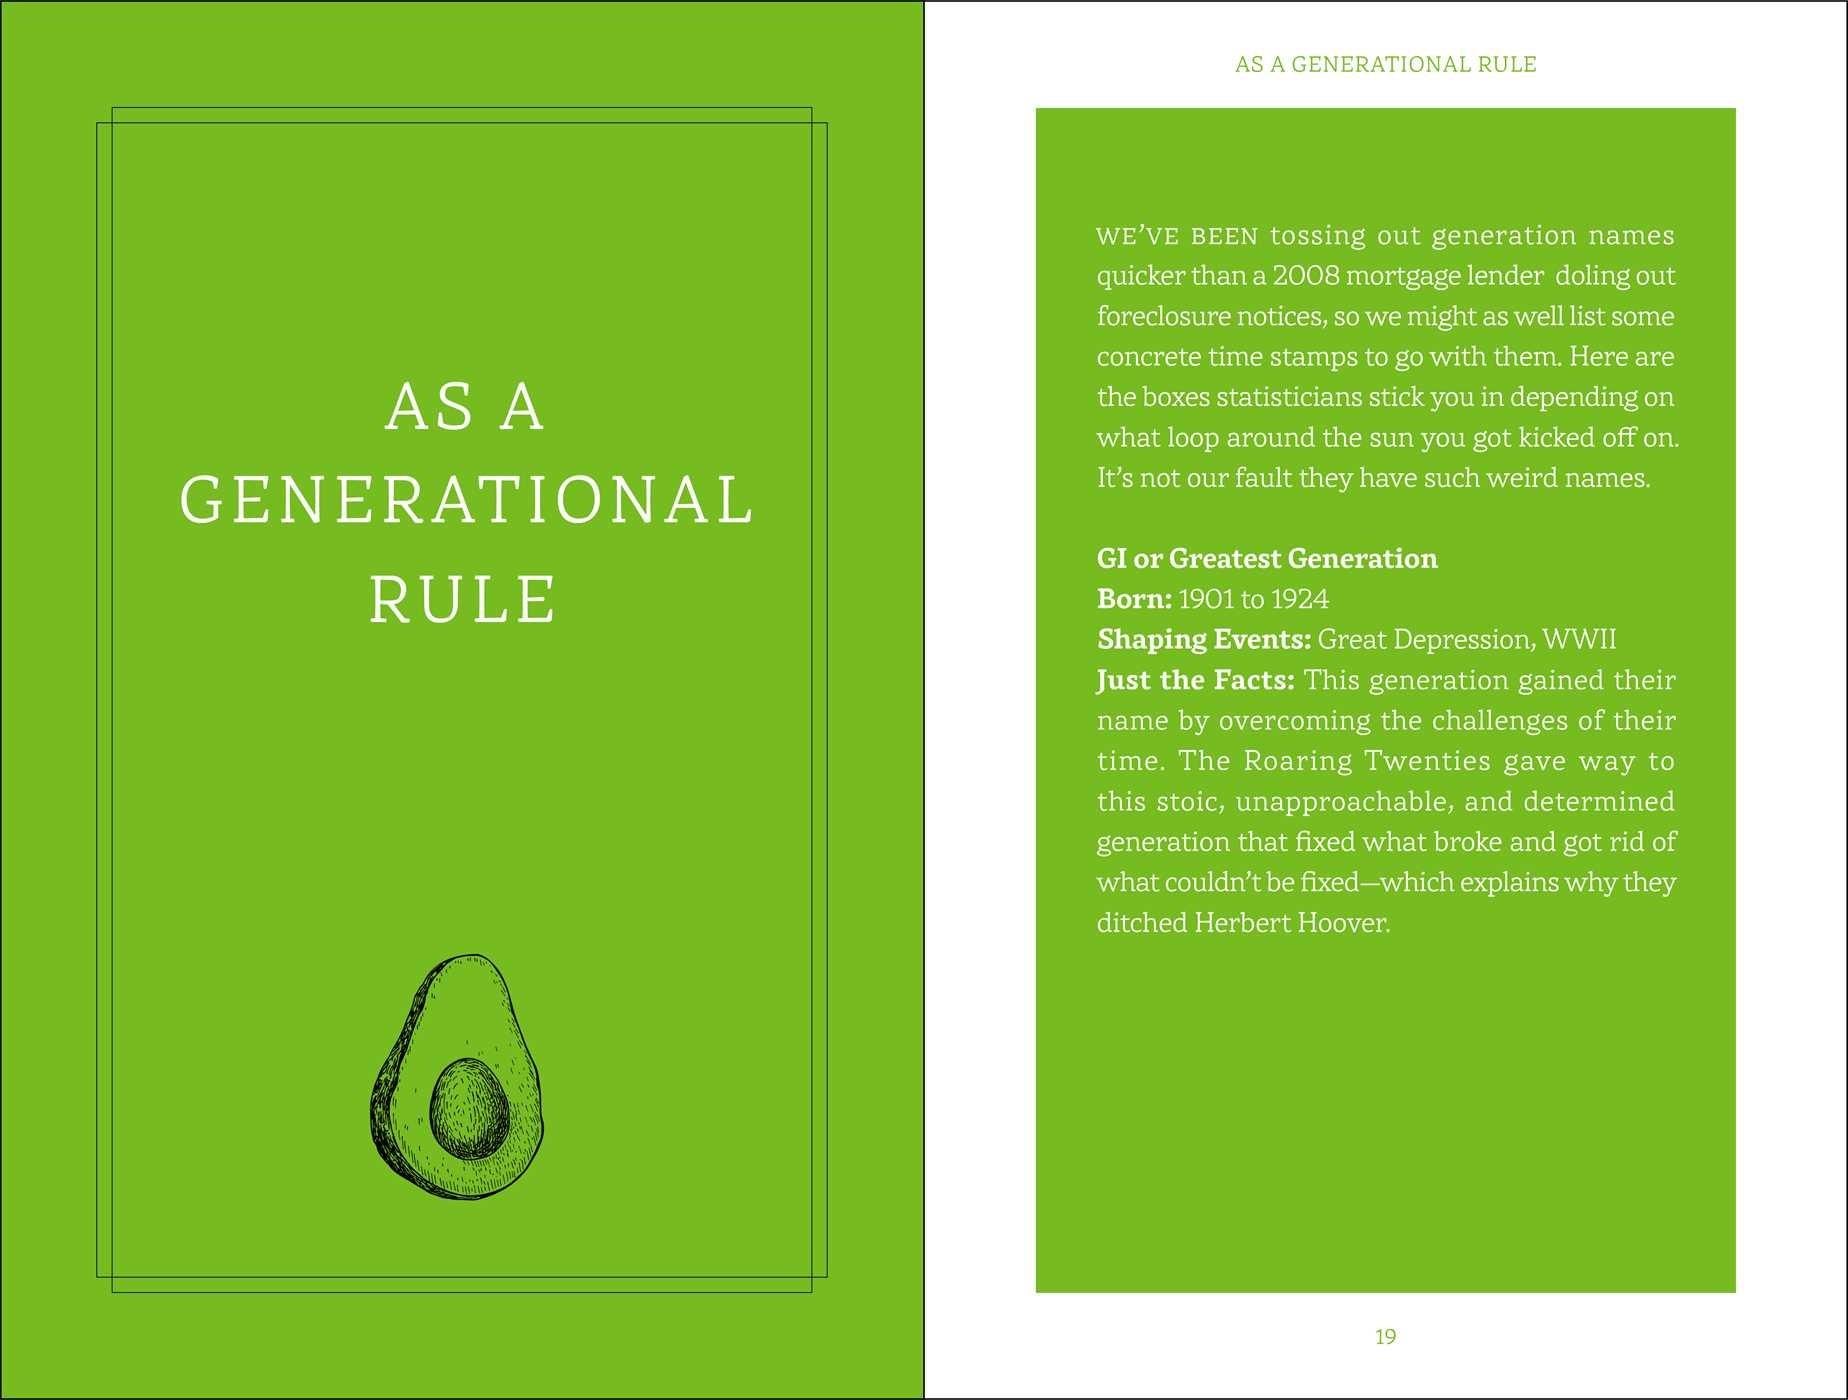 The avocado toast manifesto 9781604338560.in04